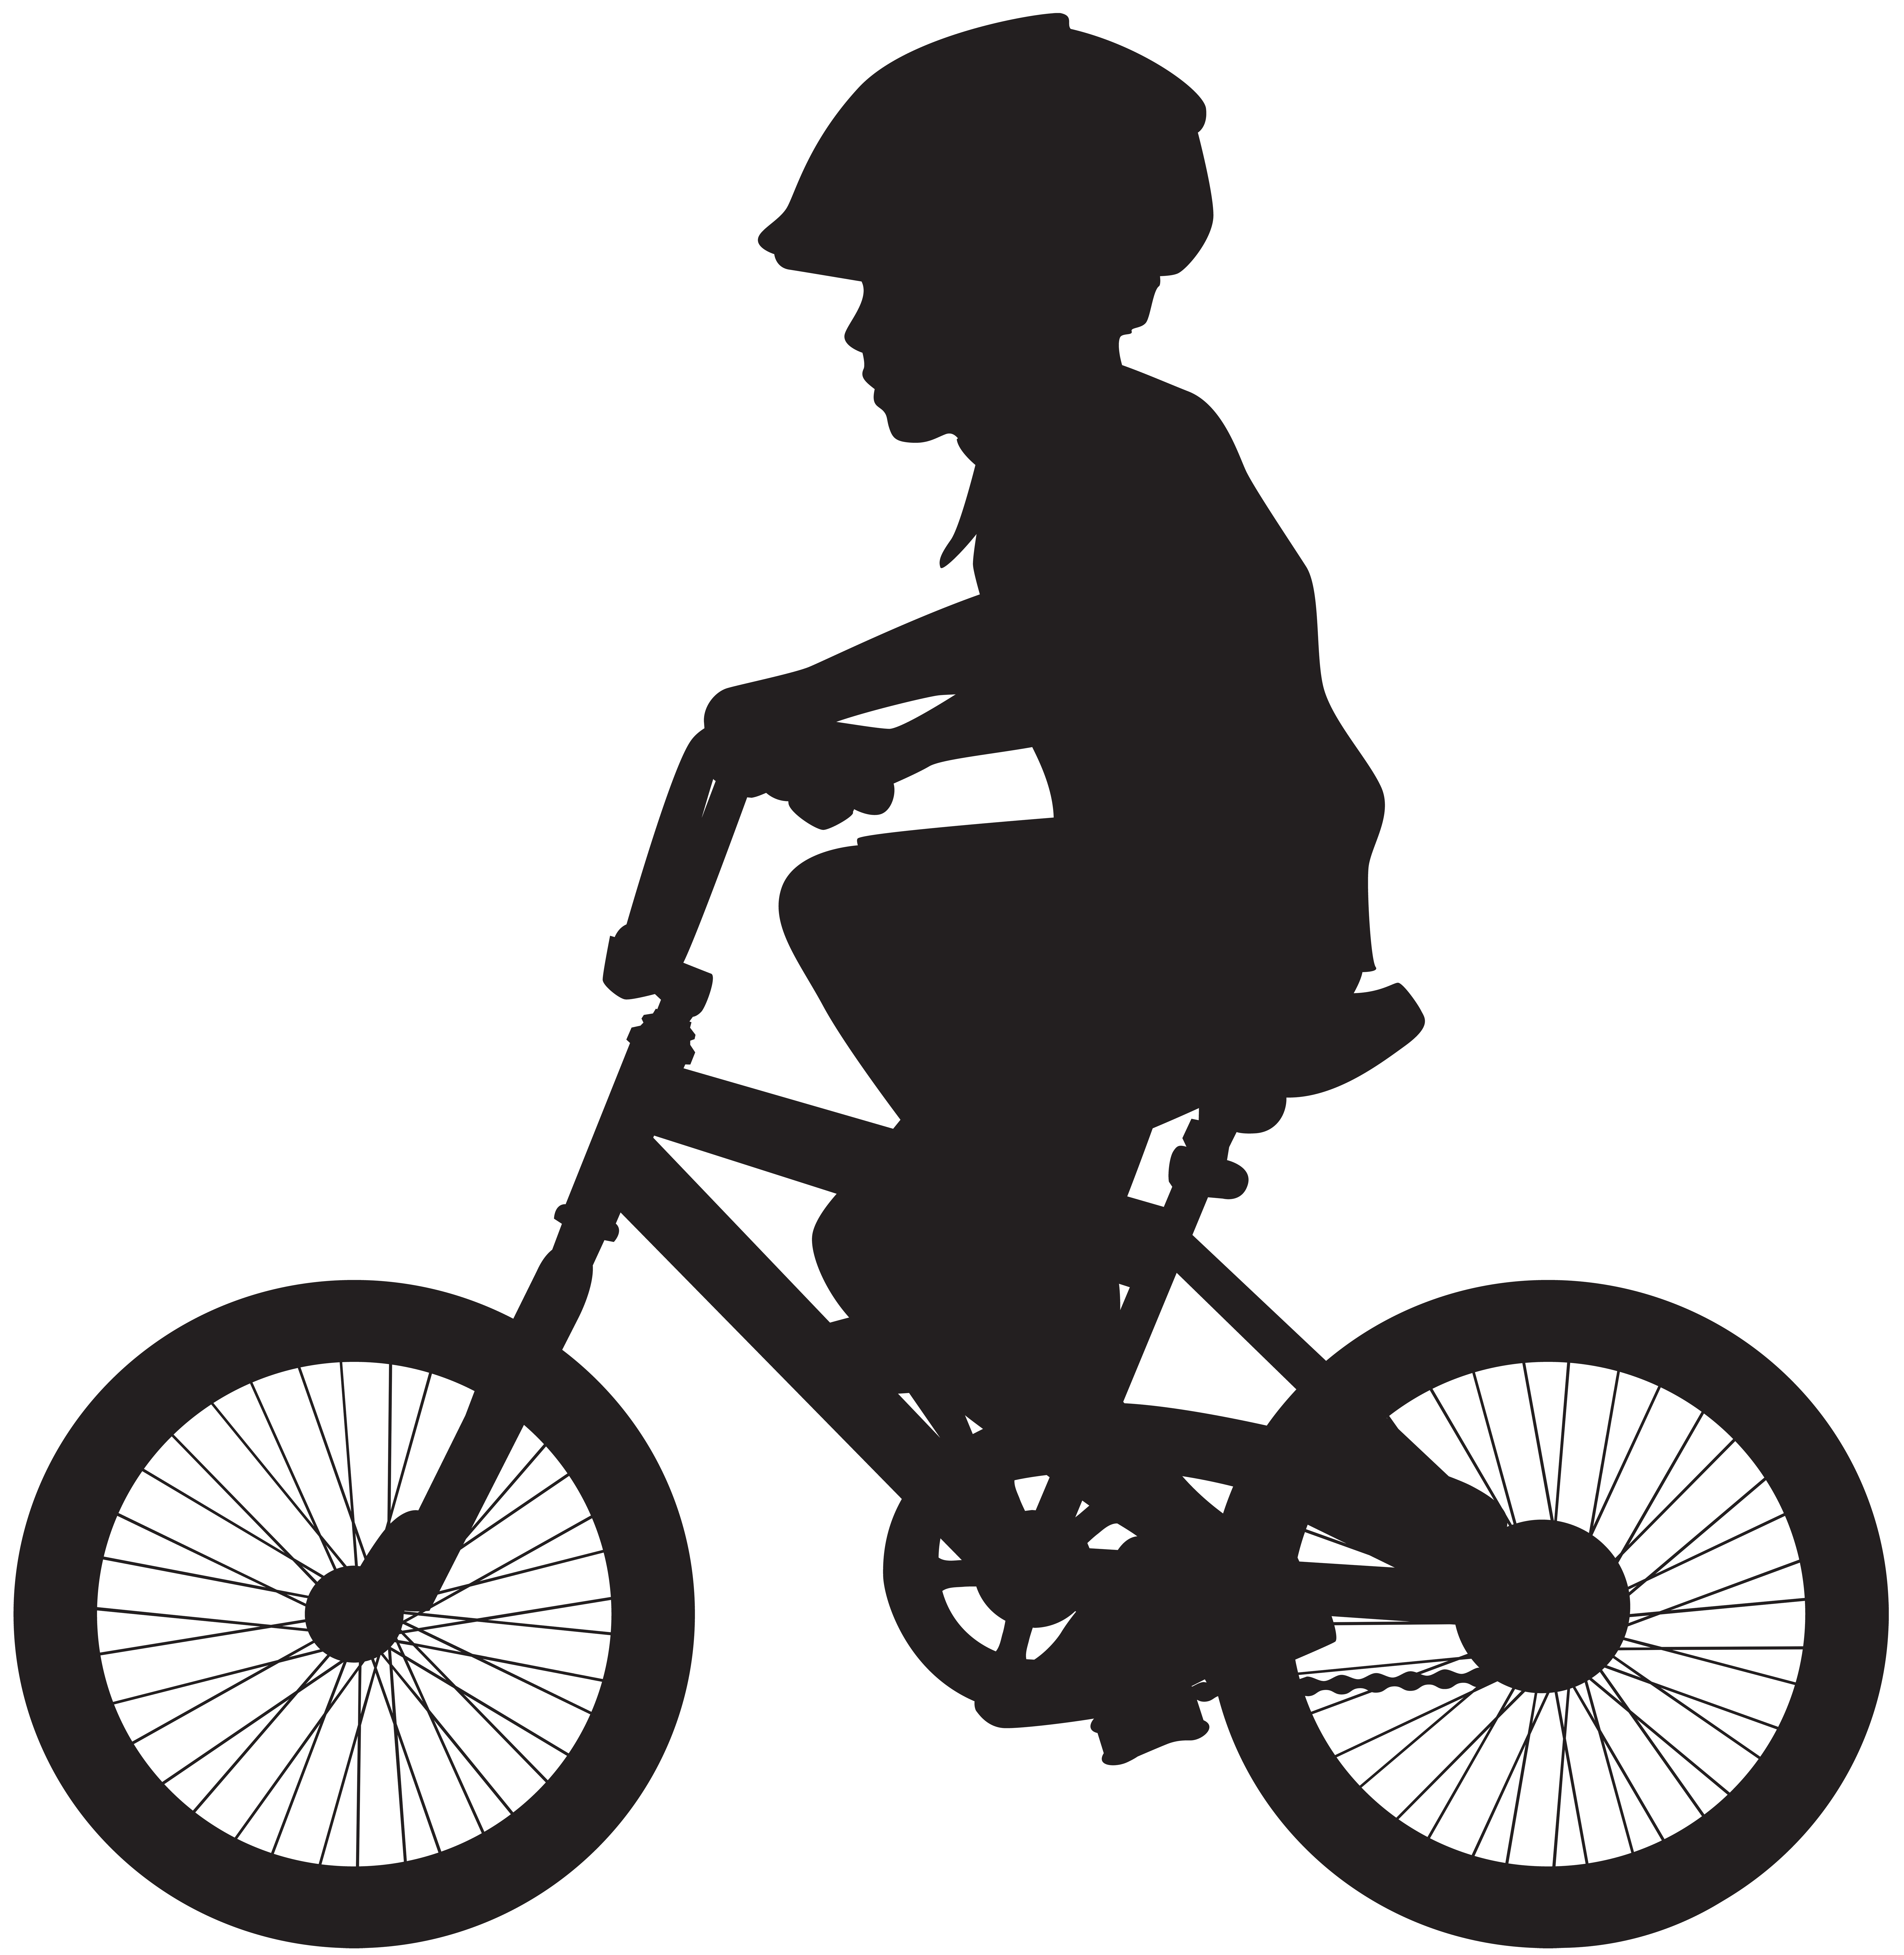 Bicycle Mountain bike Cycling Illustration.